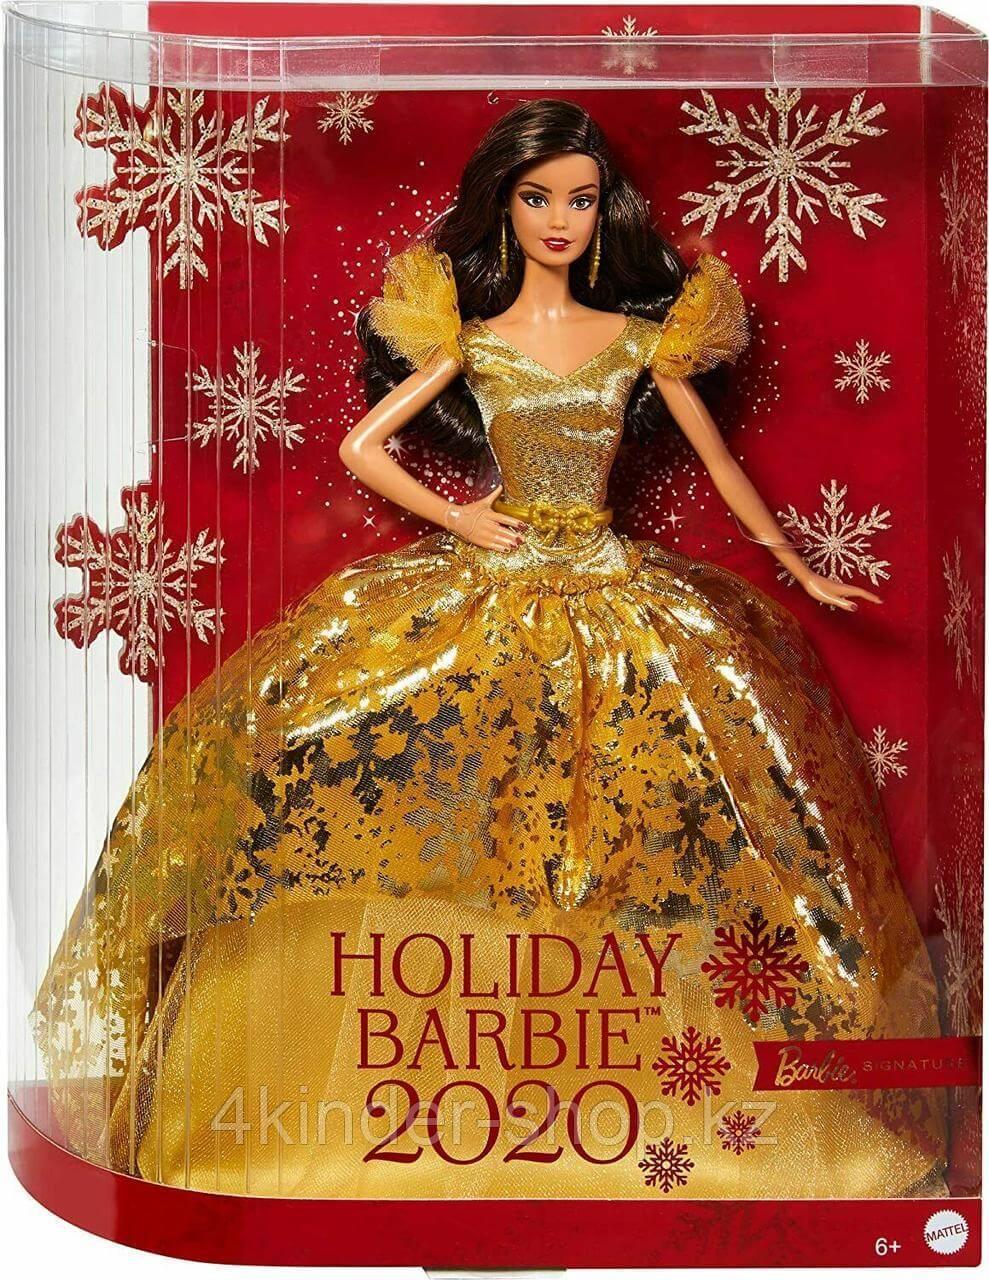 Кукла Барби Рождество-2020 Holiday Barbie латиноамериканка коллекционная Mattel - фото 1